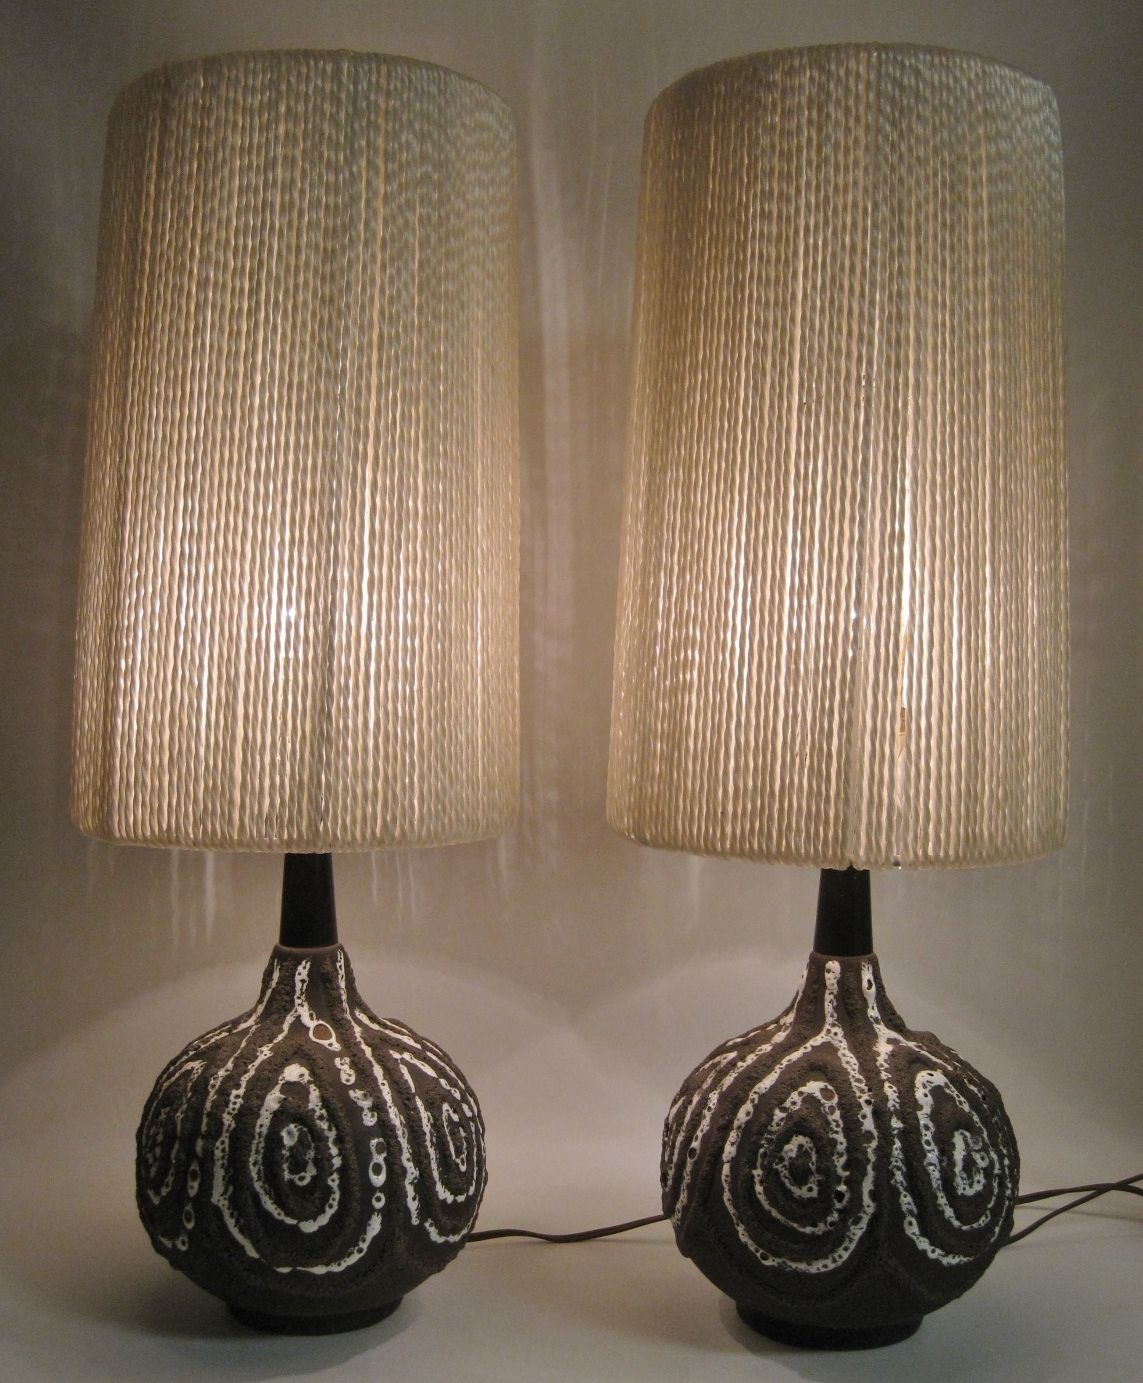 Pair Of Mid Century Modern Art Pottery Lamps Pottery Lamp Mid Century Lamp Mid Century Modern Art